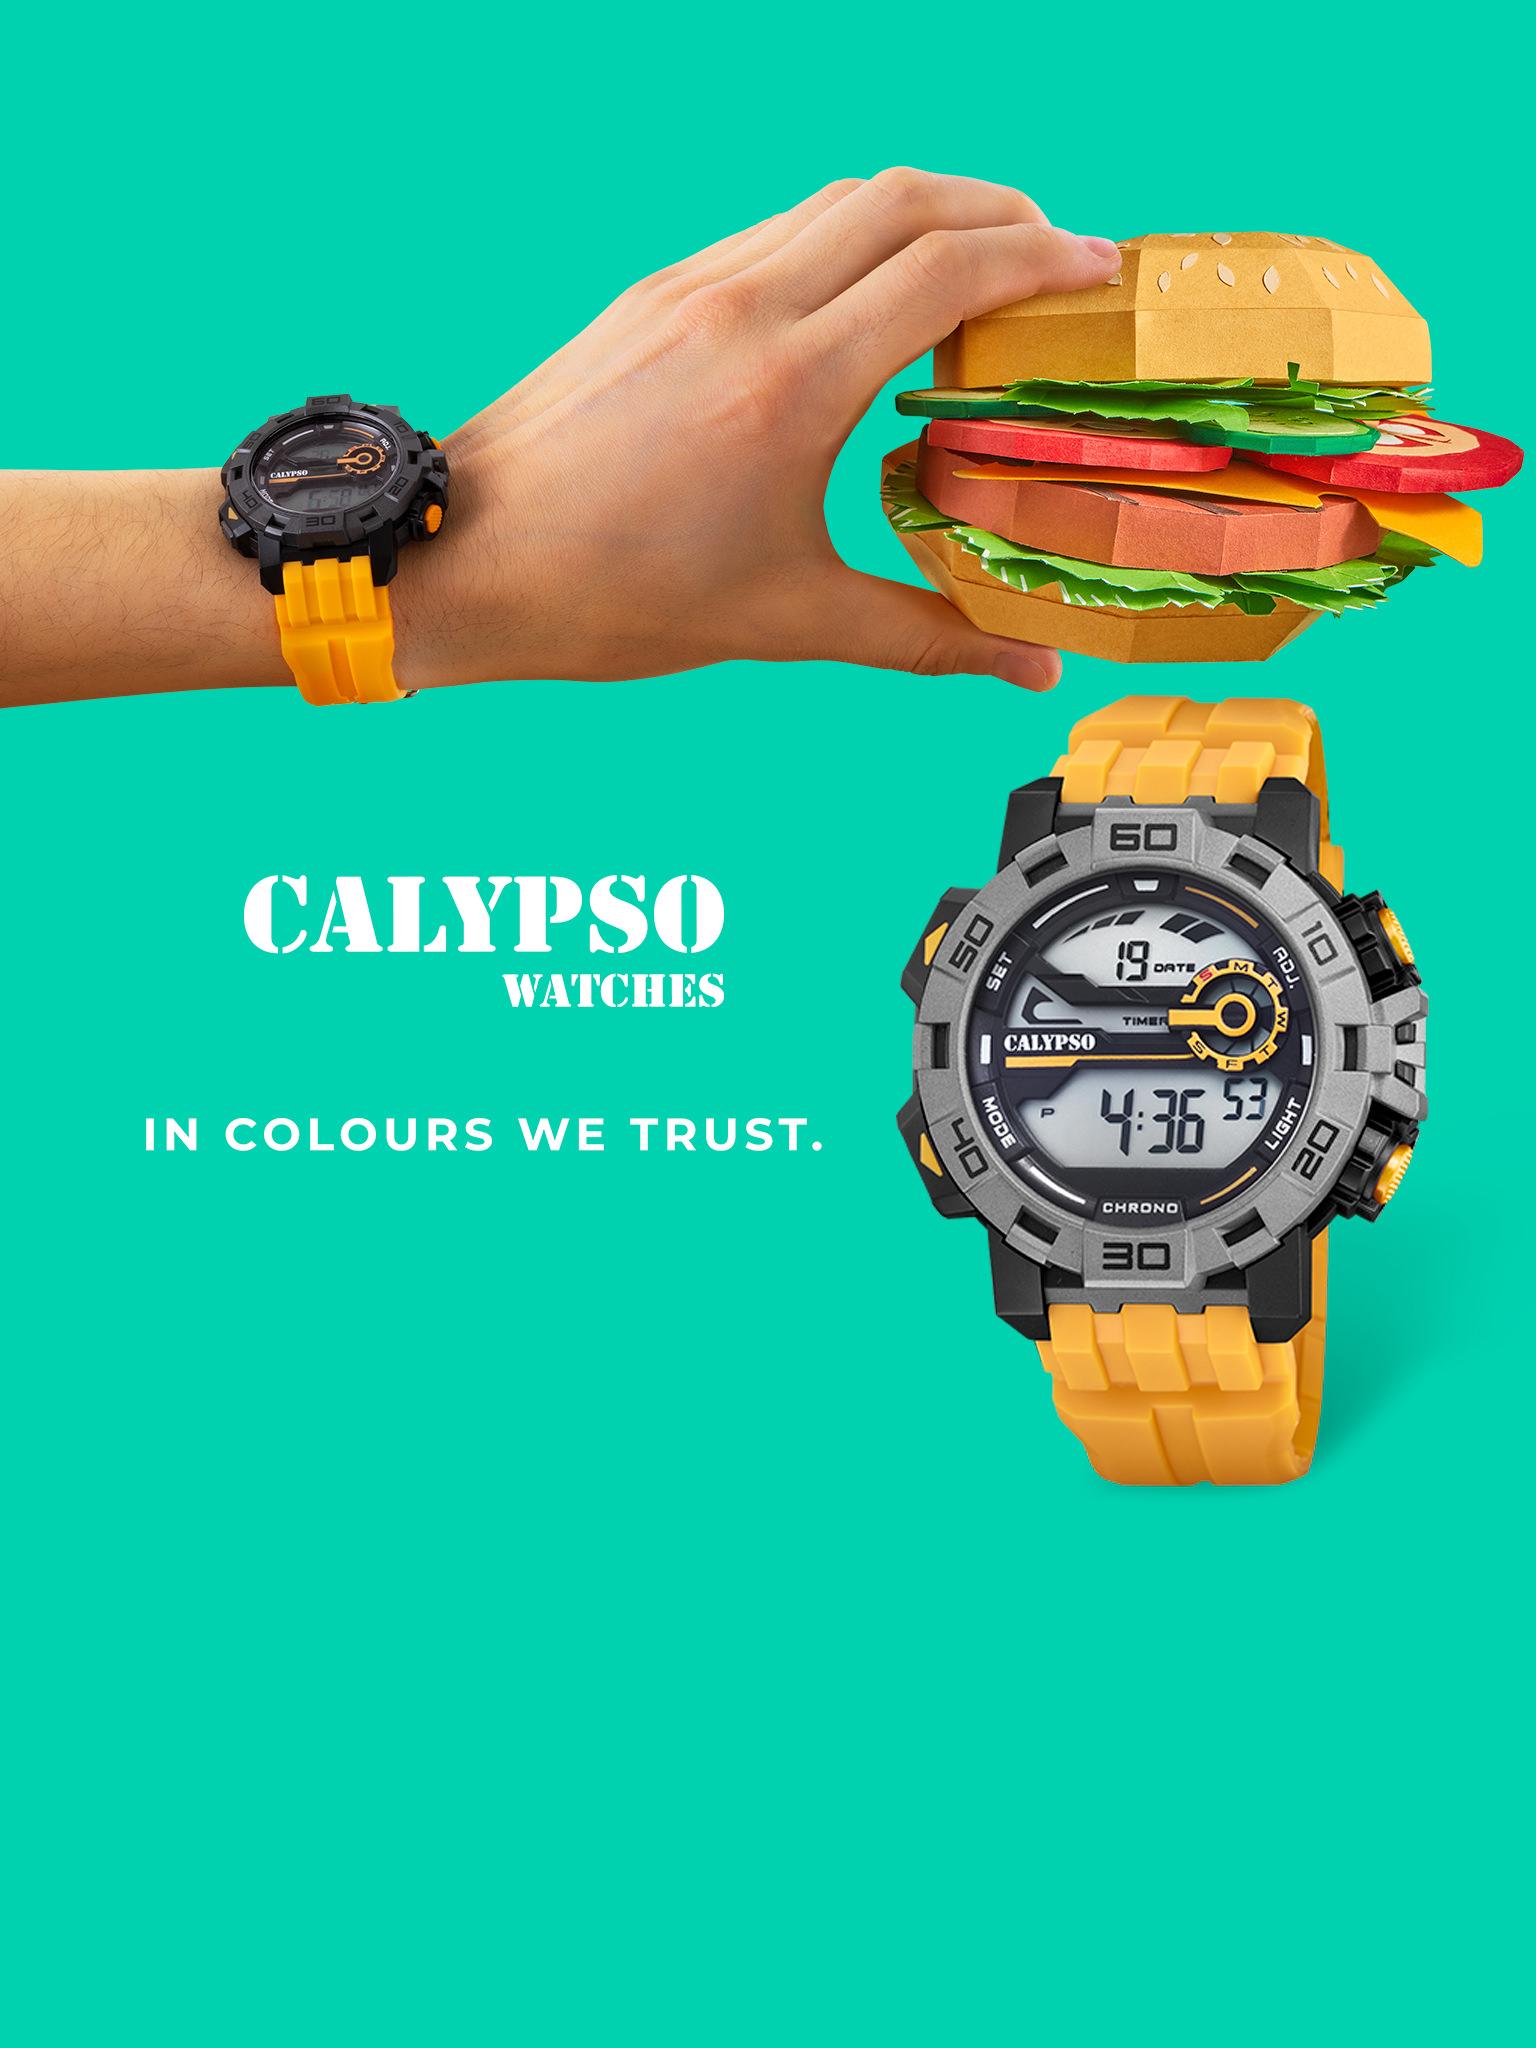 https://termekek.festina.hu/sites/default/files/revslider/image/calypso-watches-2021-tablet.jpg